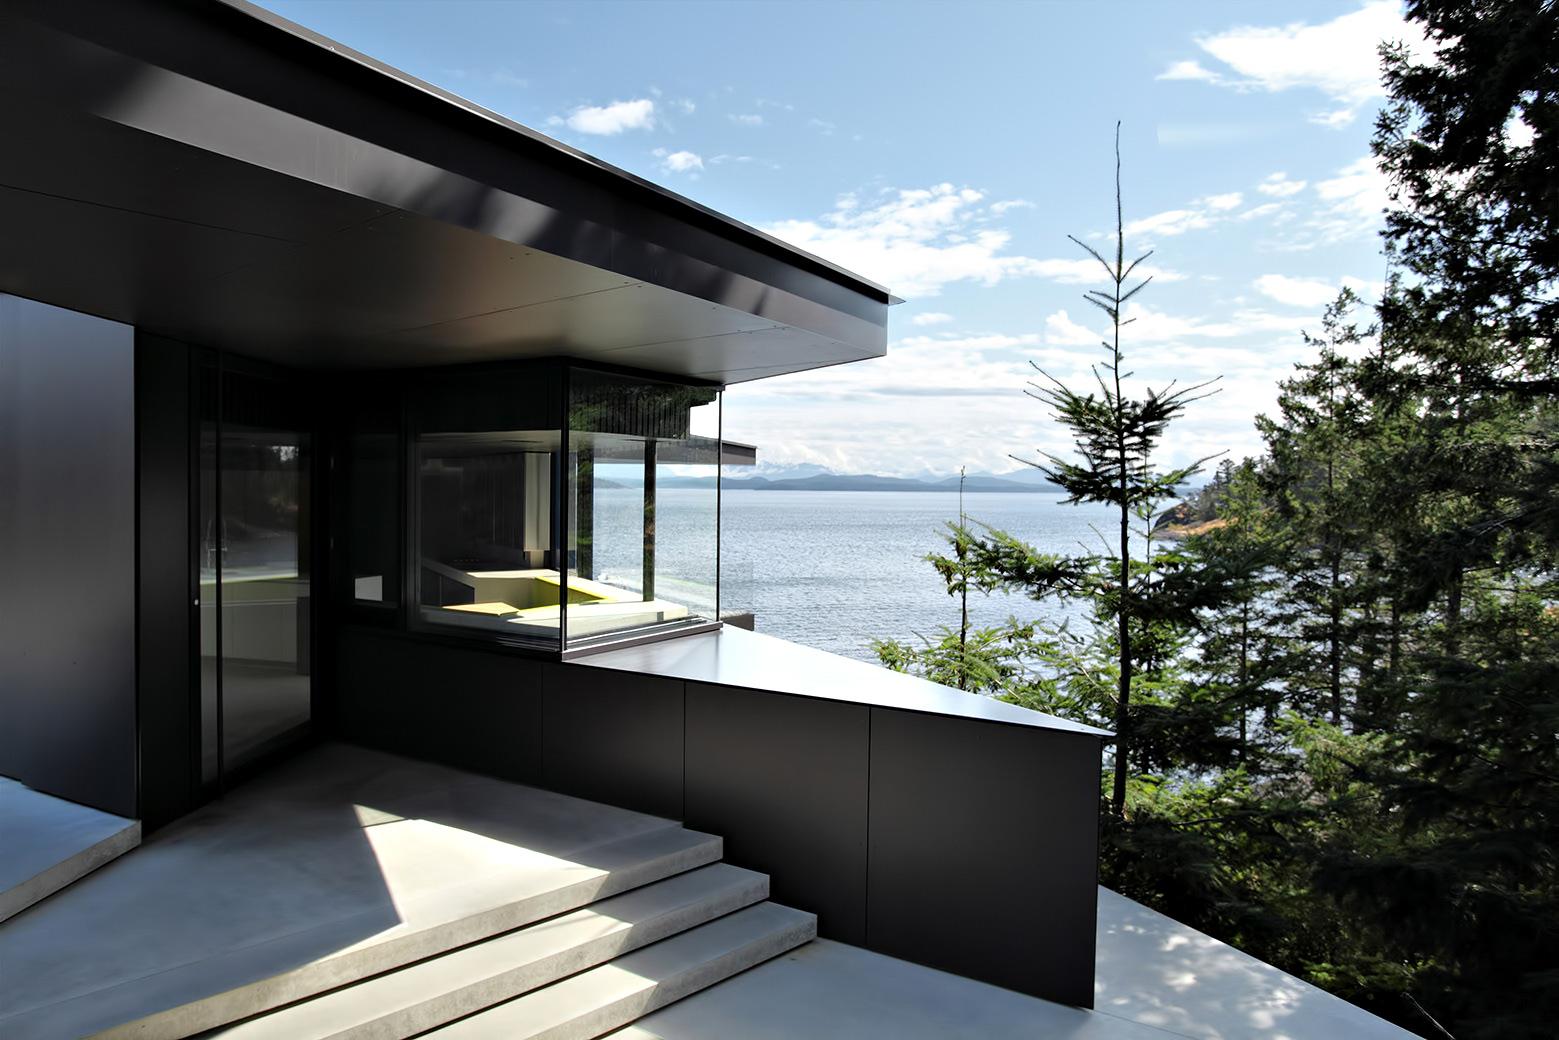 Tula House Luxury Residence – Quadra Island, BC, Canada